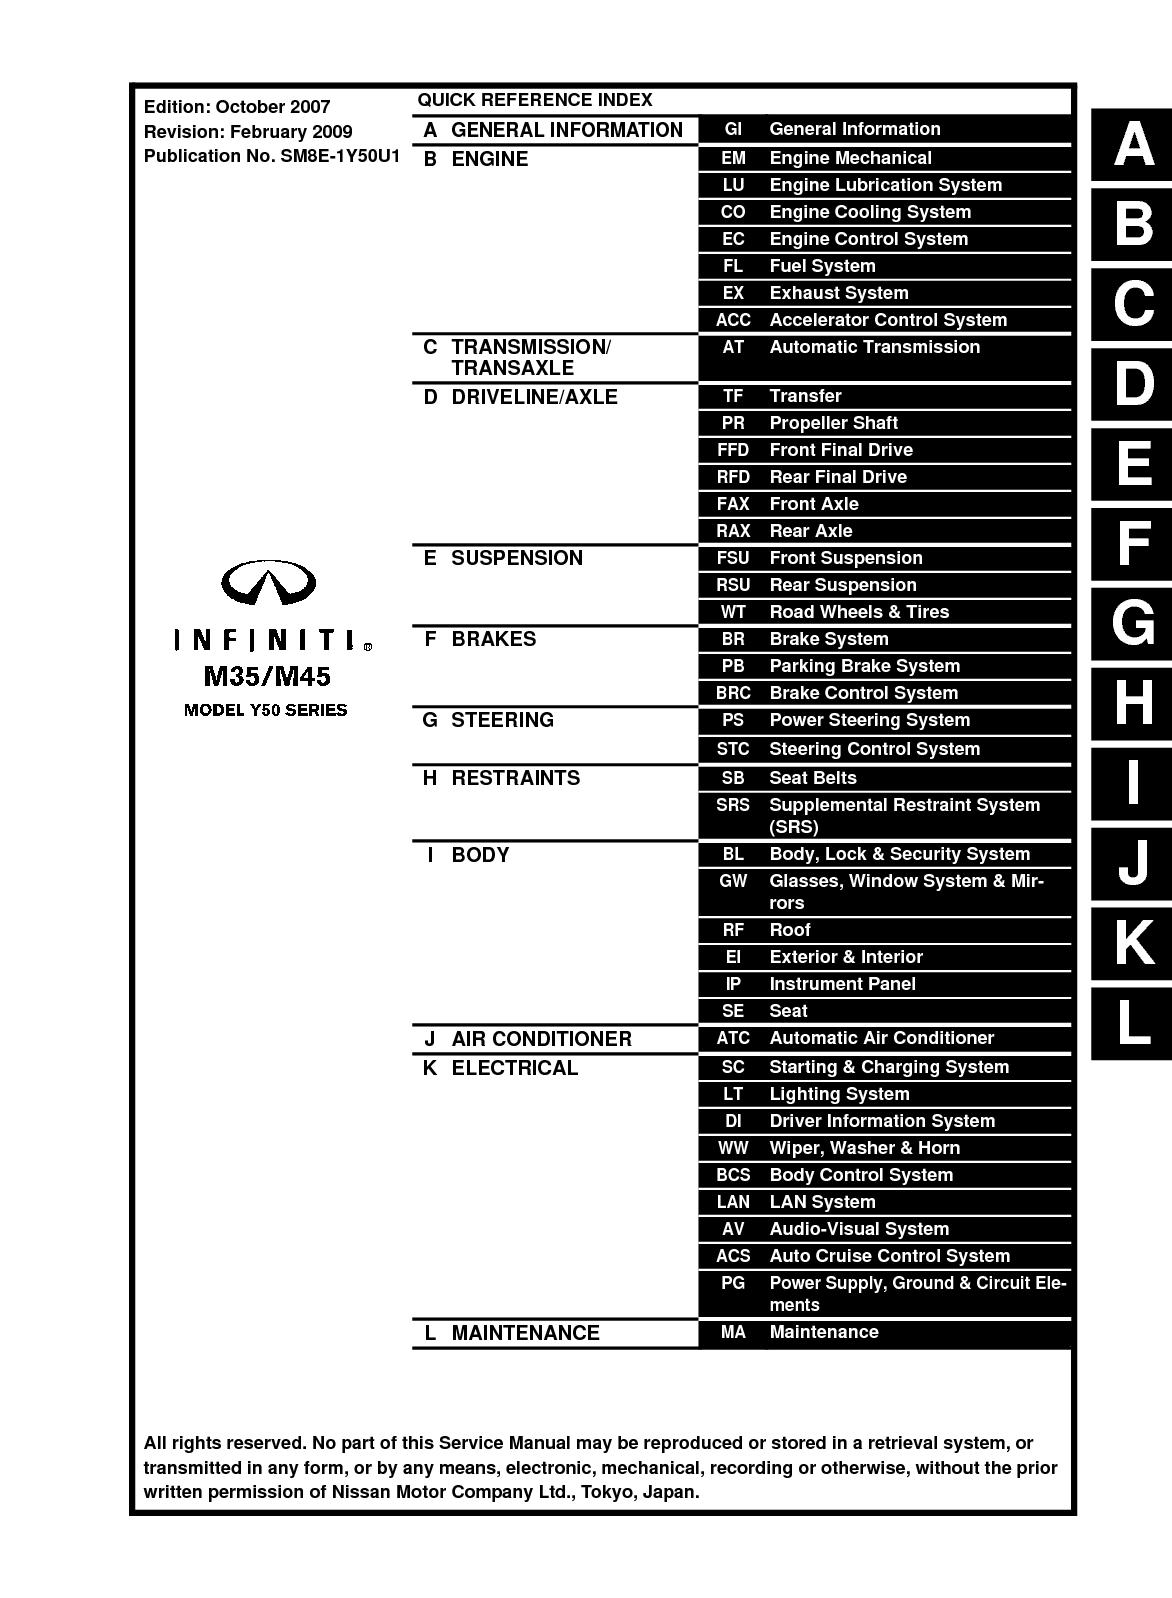 calam o 2008 infiniti m35 m45 service repair manual rh calameo com 2007 infiniti m35 service manual 2006 infiniti m35 service manual pdf